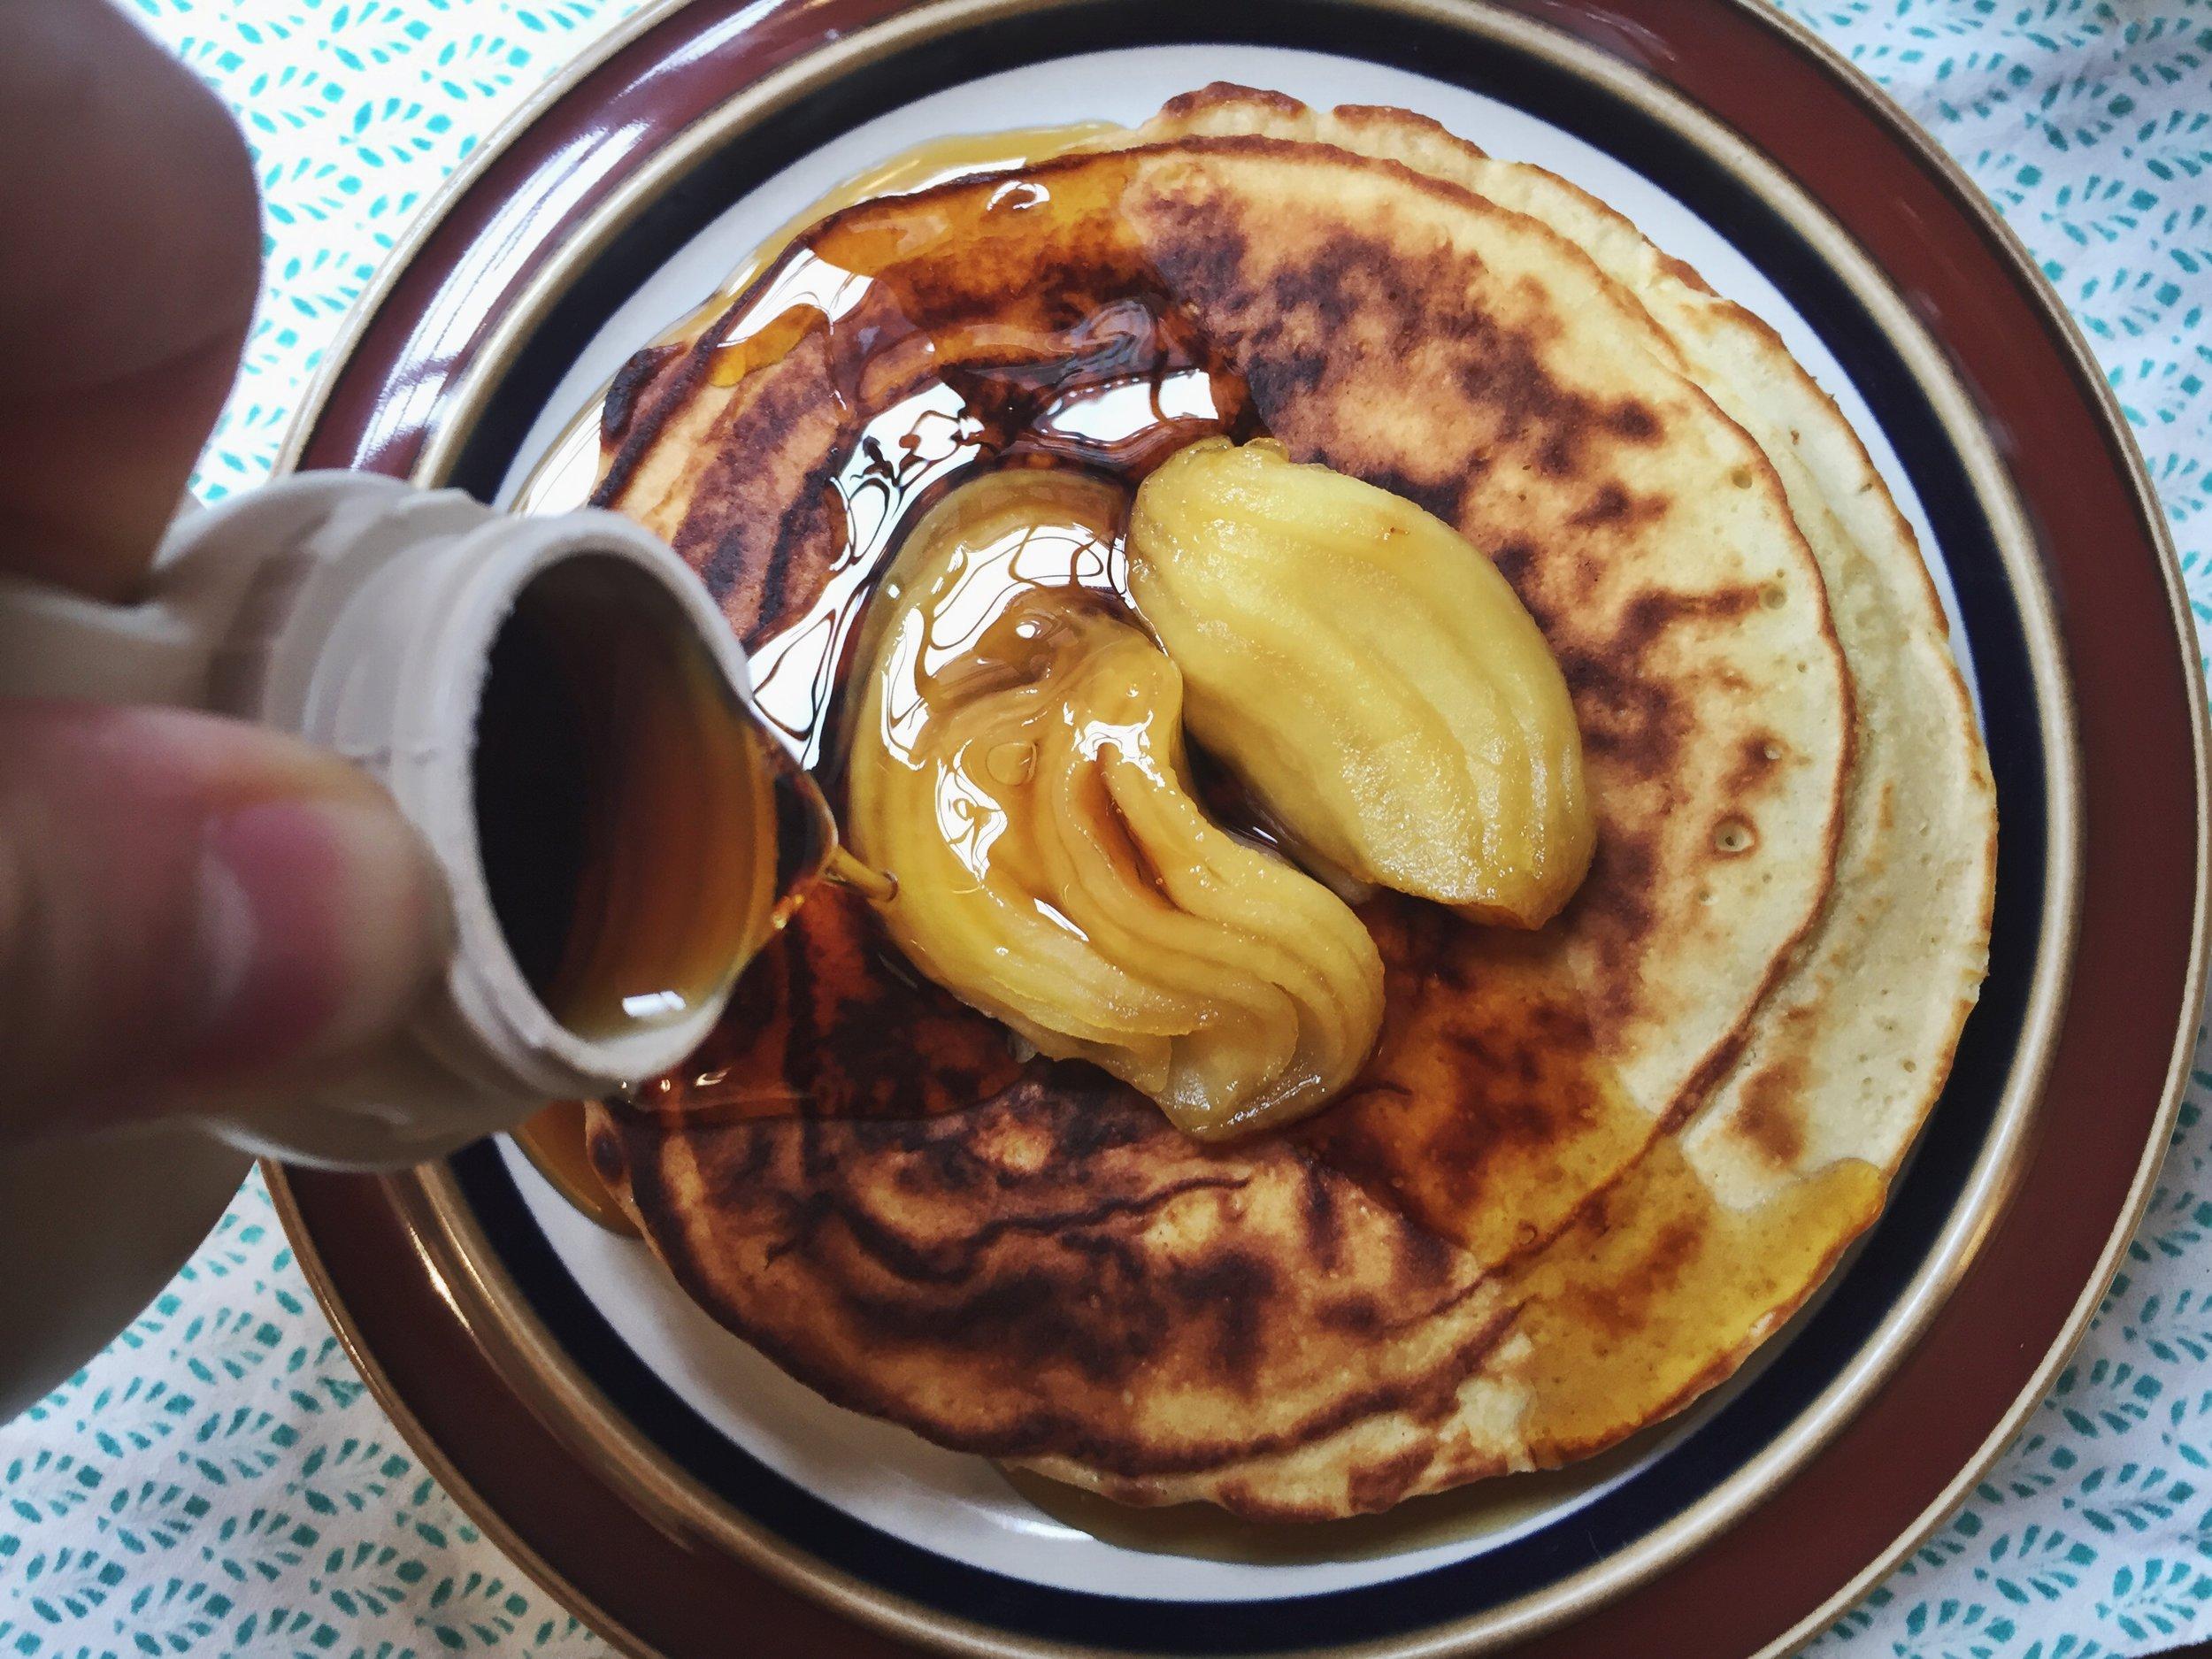 clinton-street-baking-co-pancake-maple-syrup-close-top